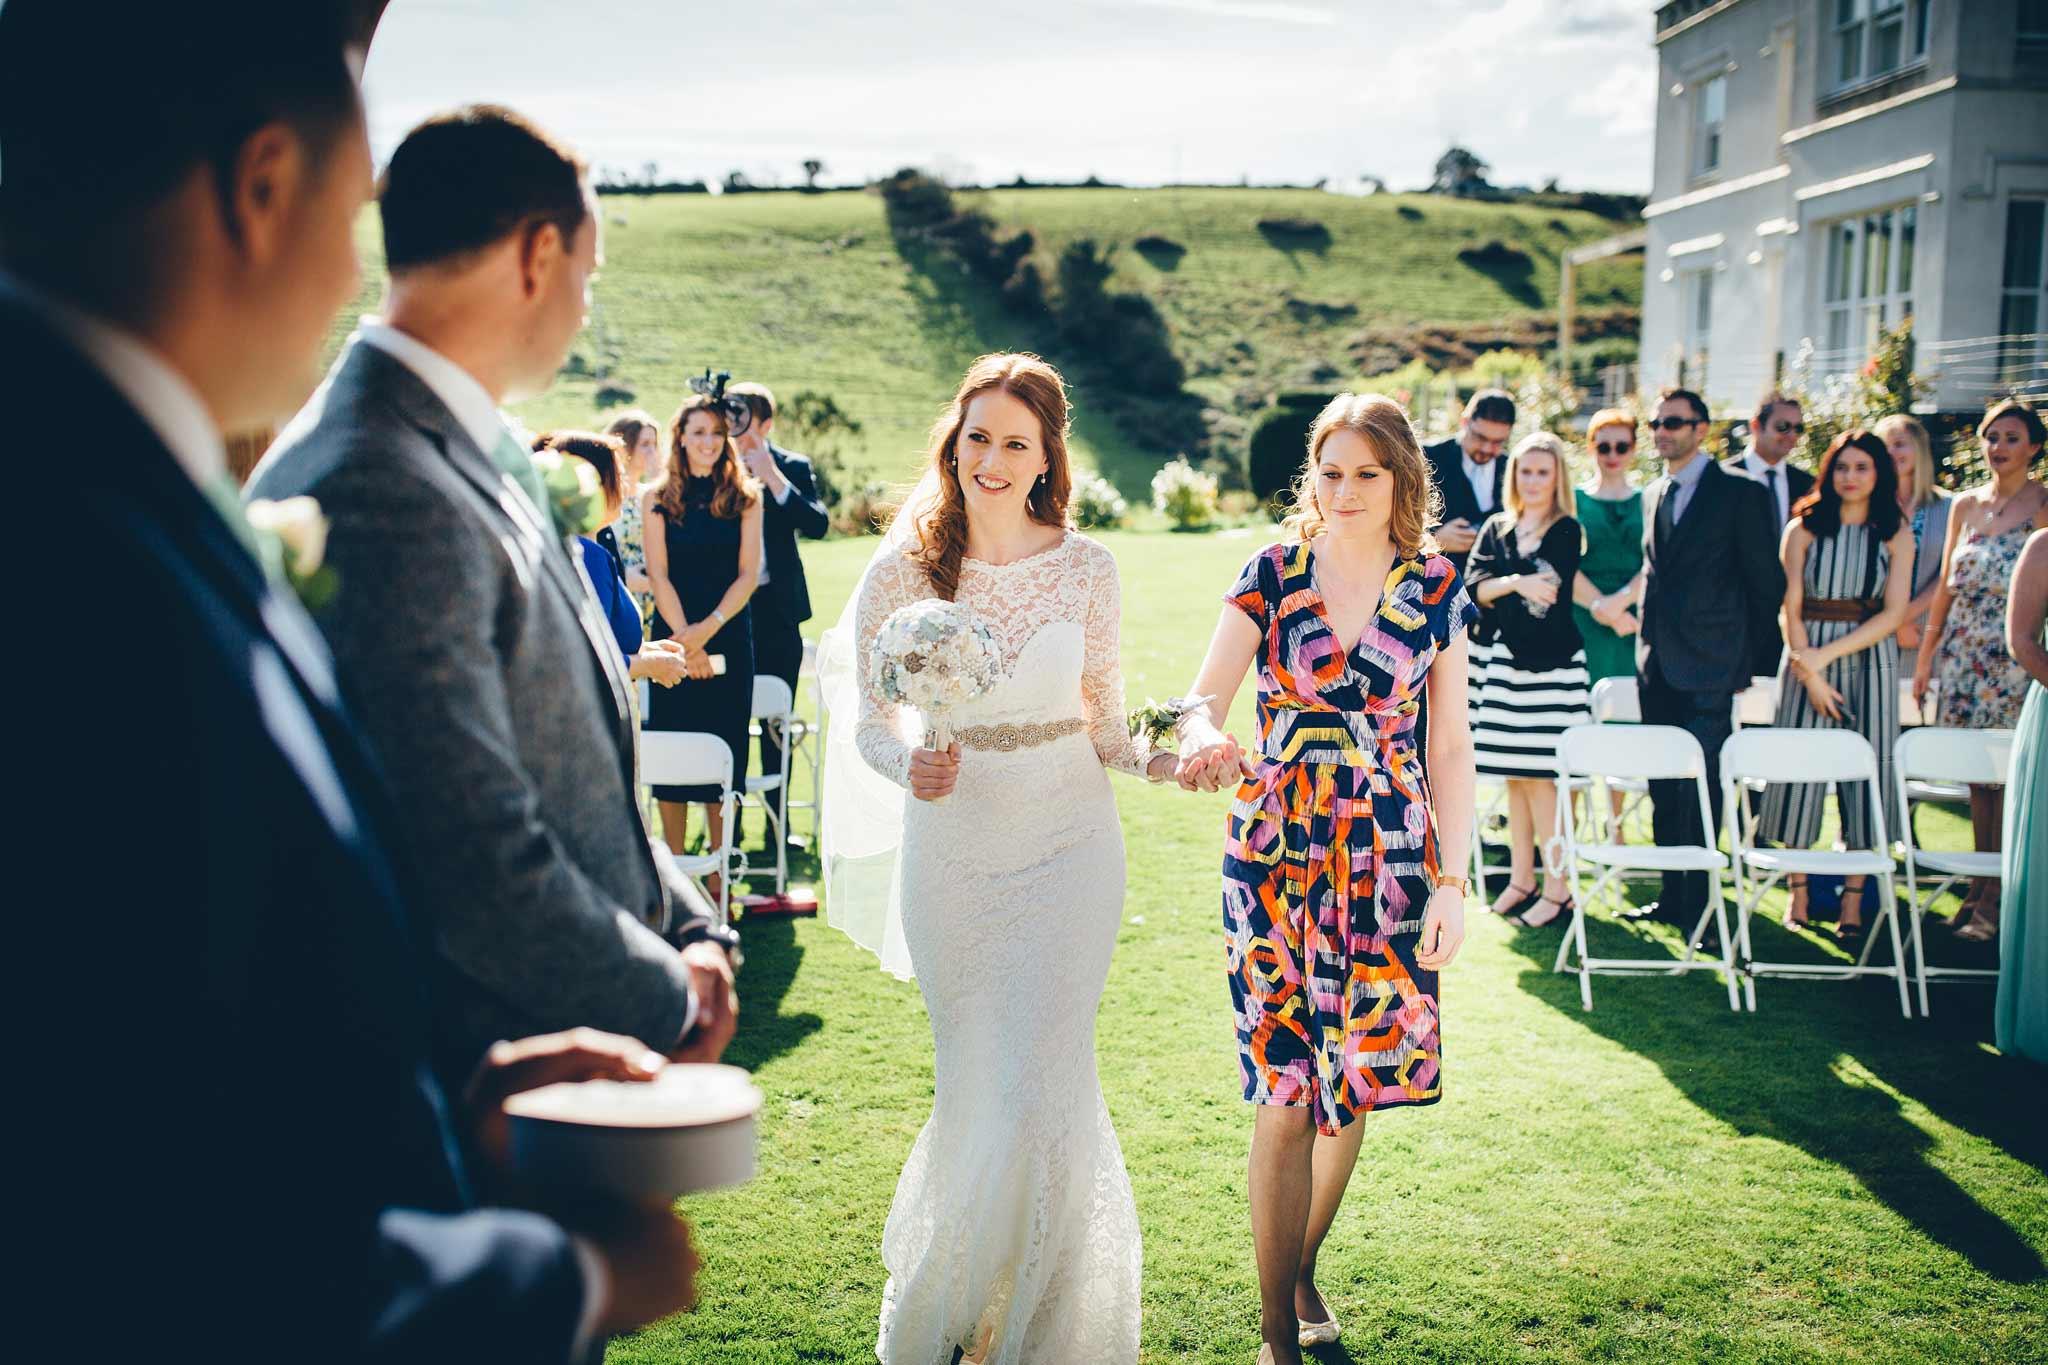 Polpier and Penpol Wedding Photographer 22